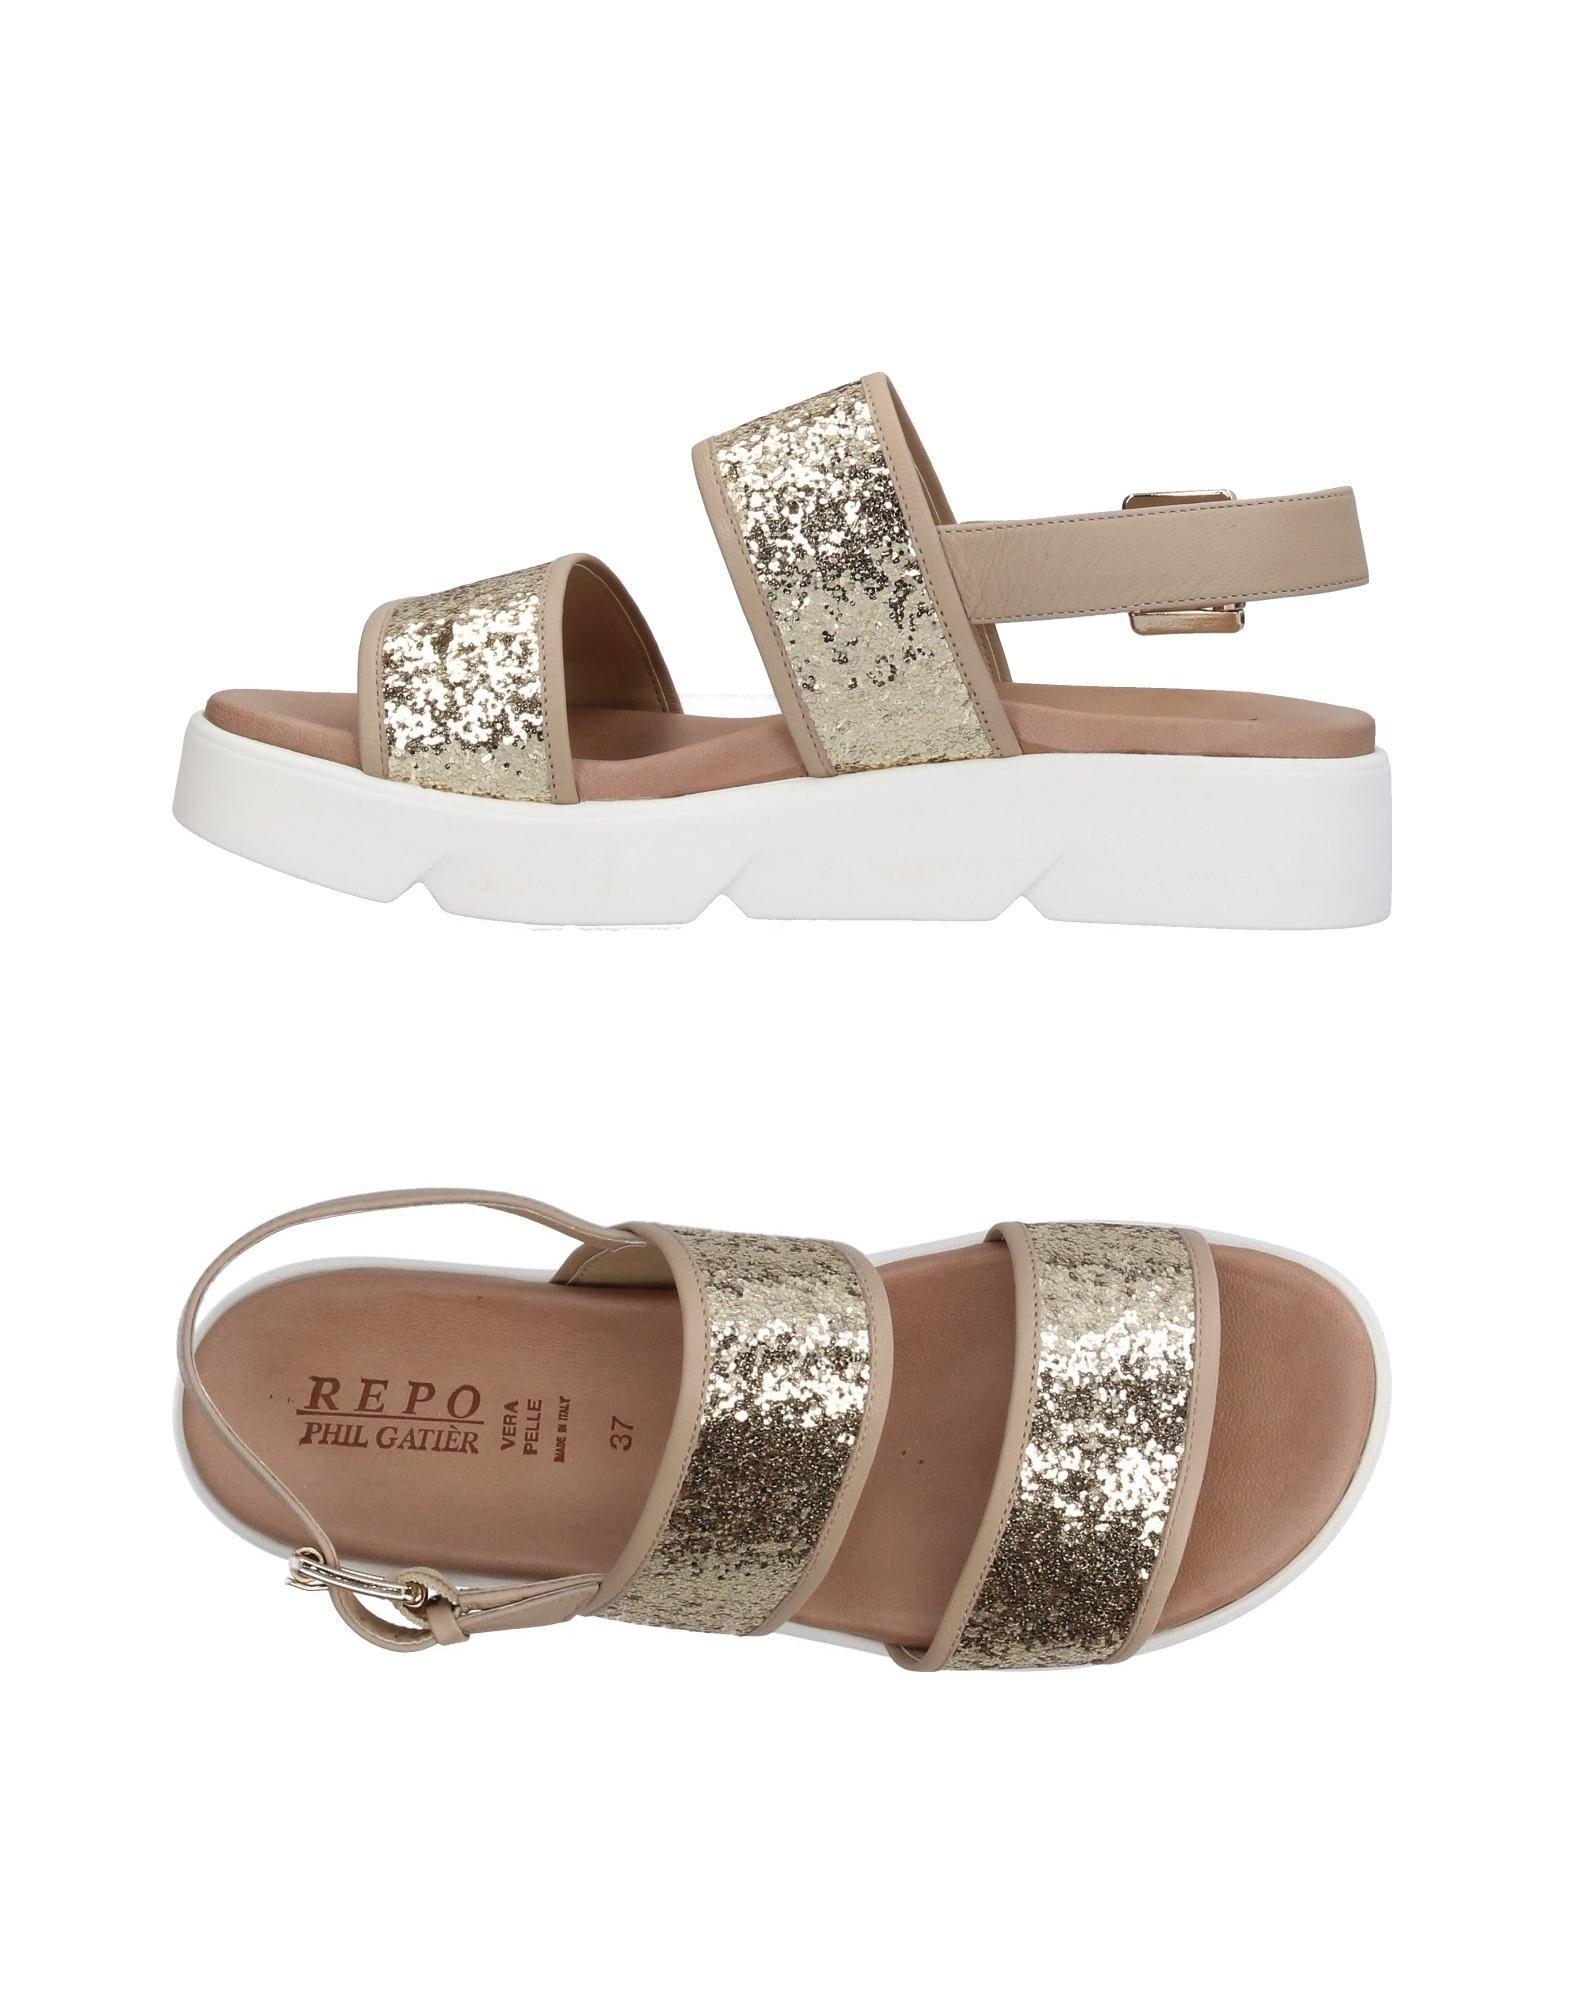 Phil Gatièr By Repo Sandalen Damen  11394961BH Gute Qualität beliebte Schuhe